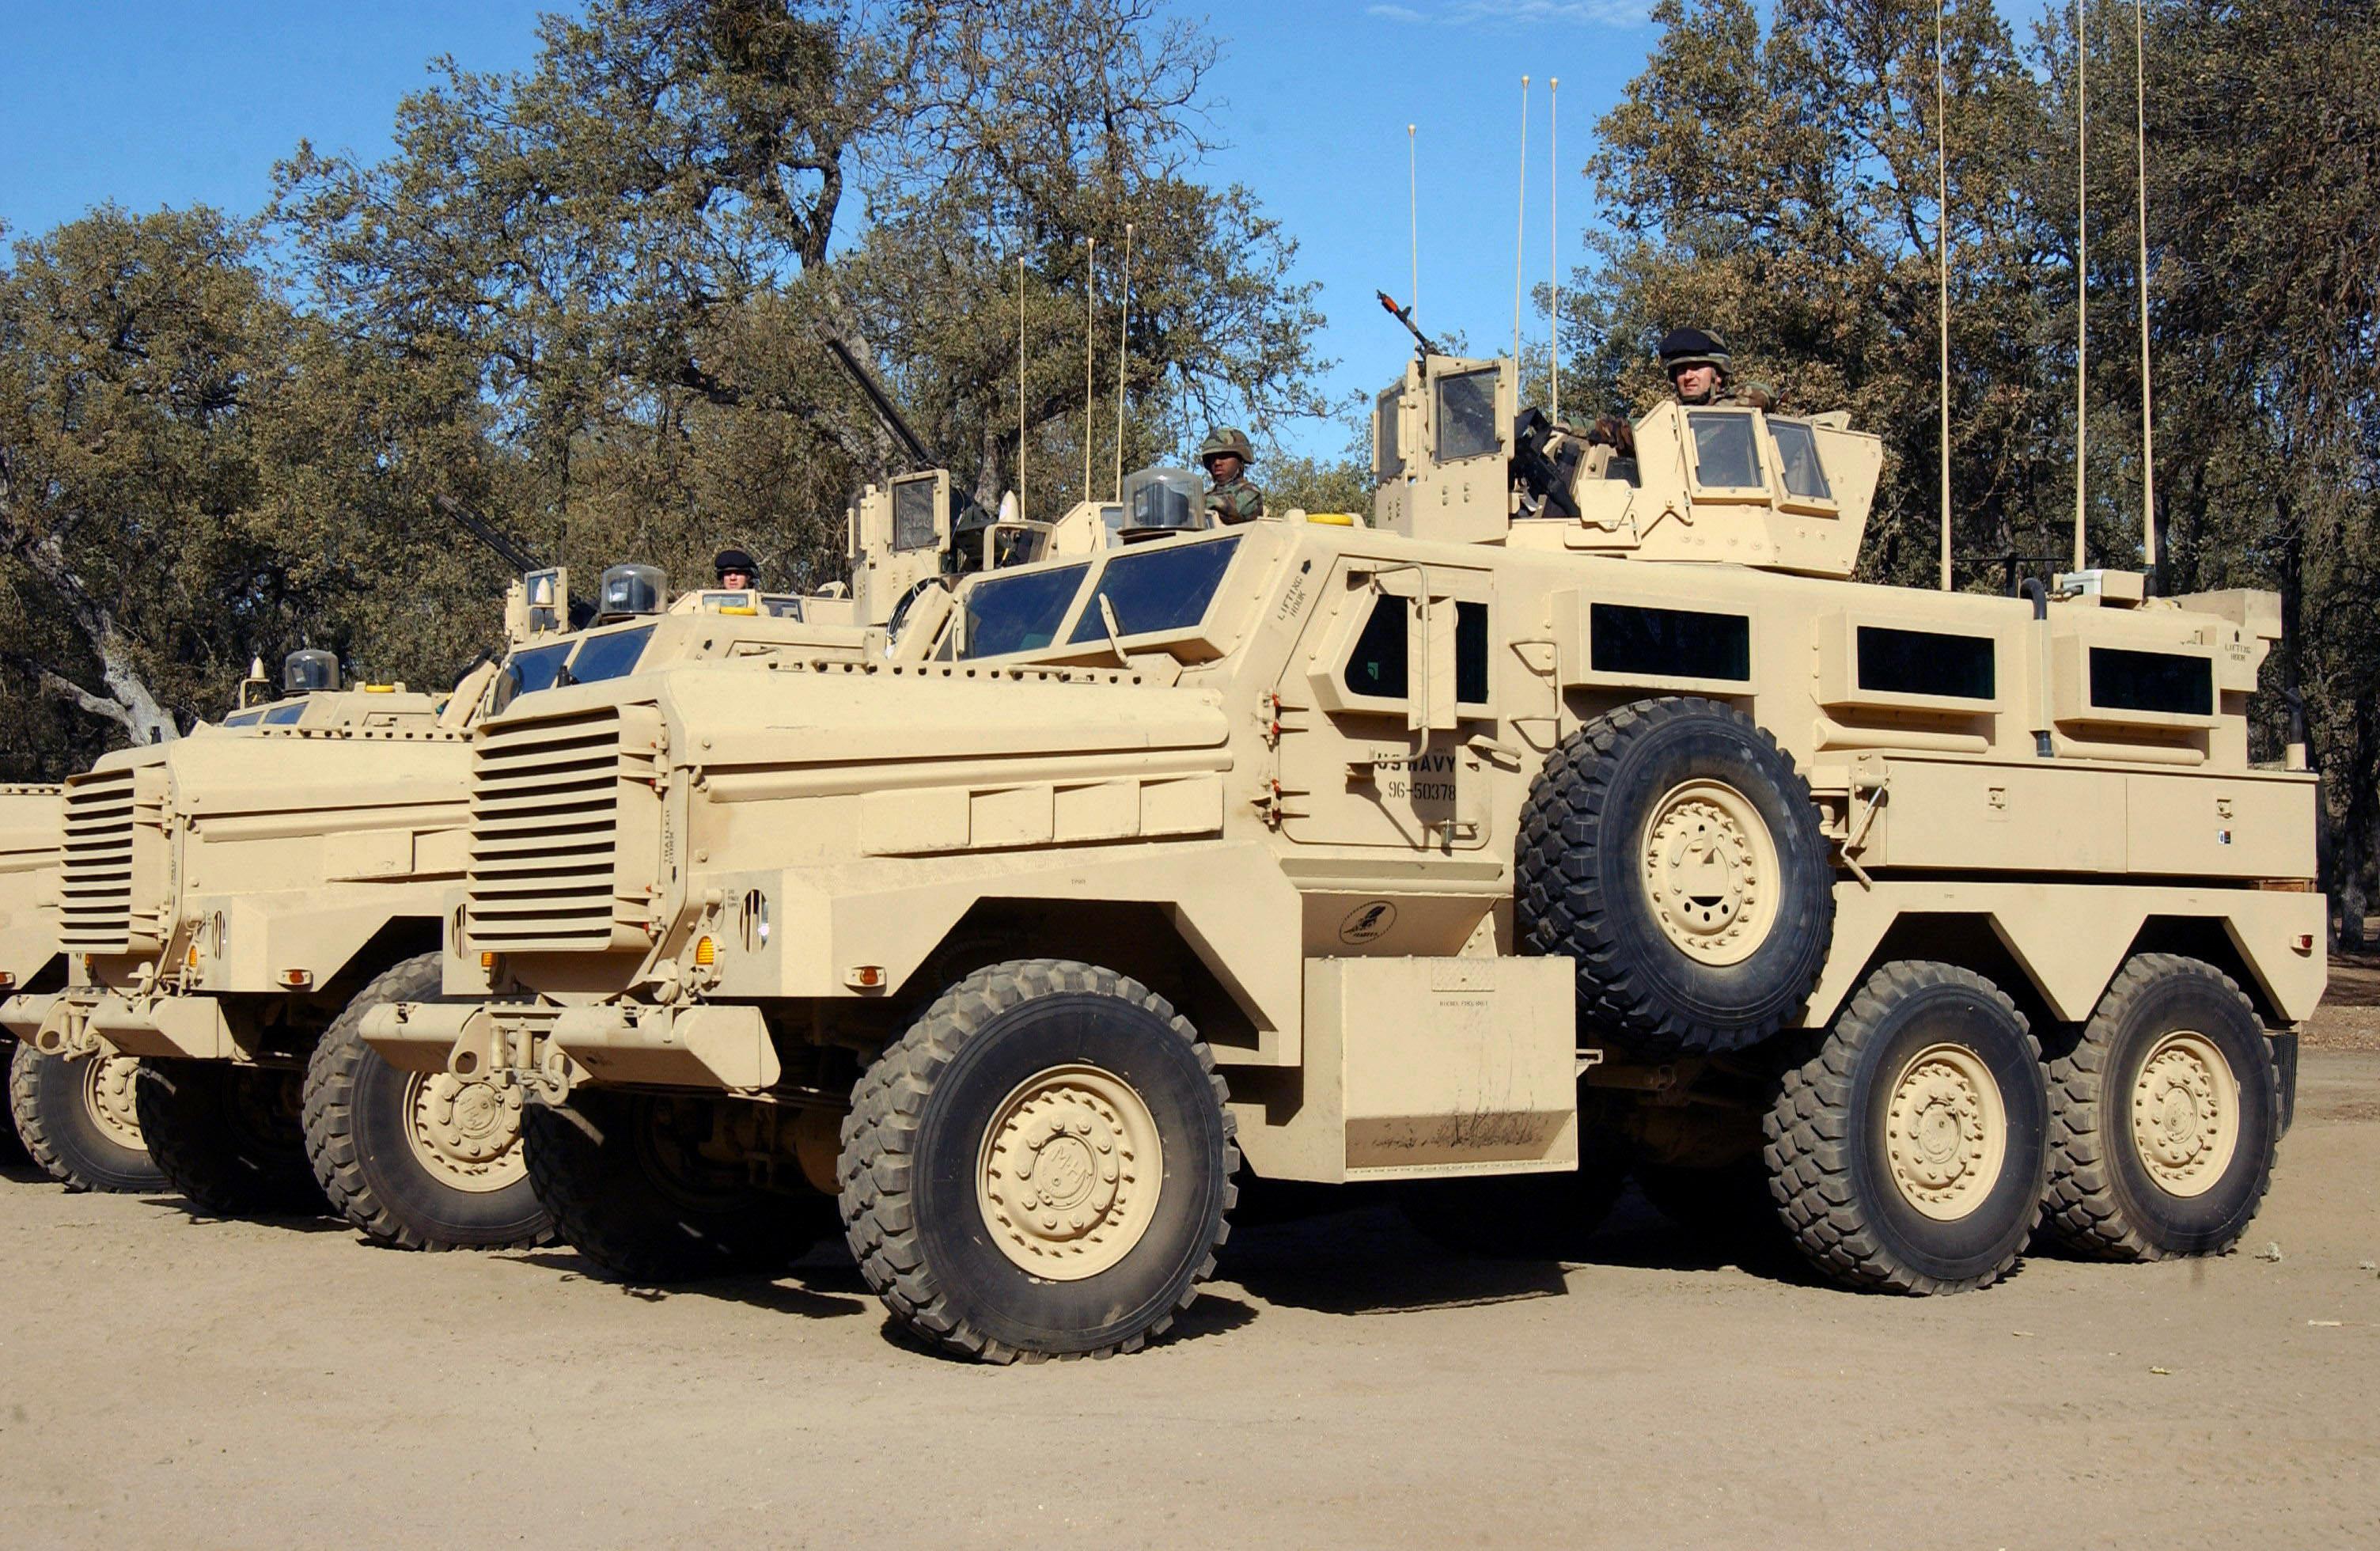 File:Mine resistant ambush protected vehicles.jpg - Wikipedia, the ...